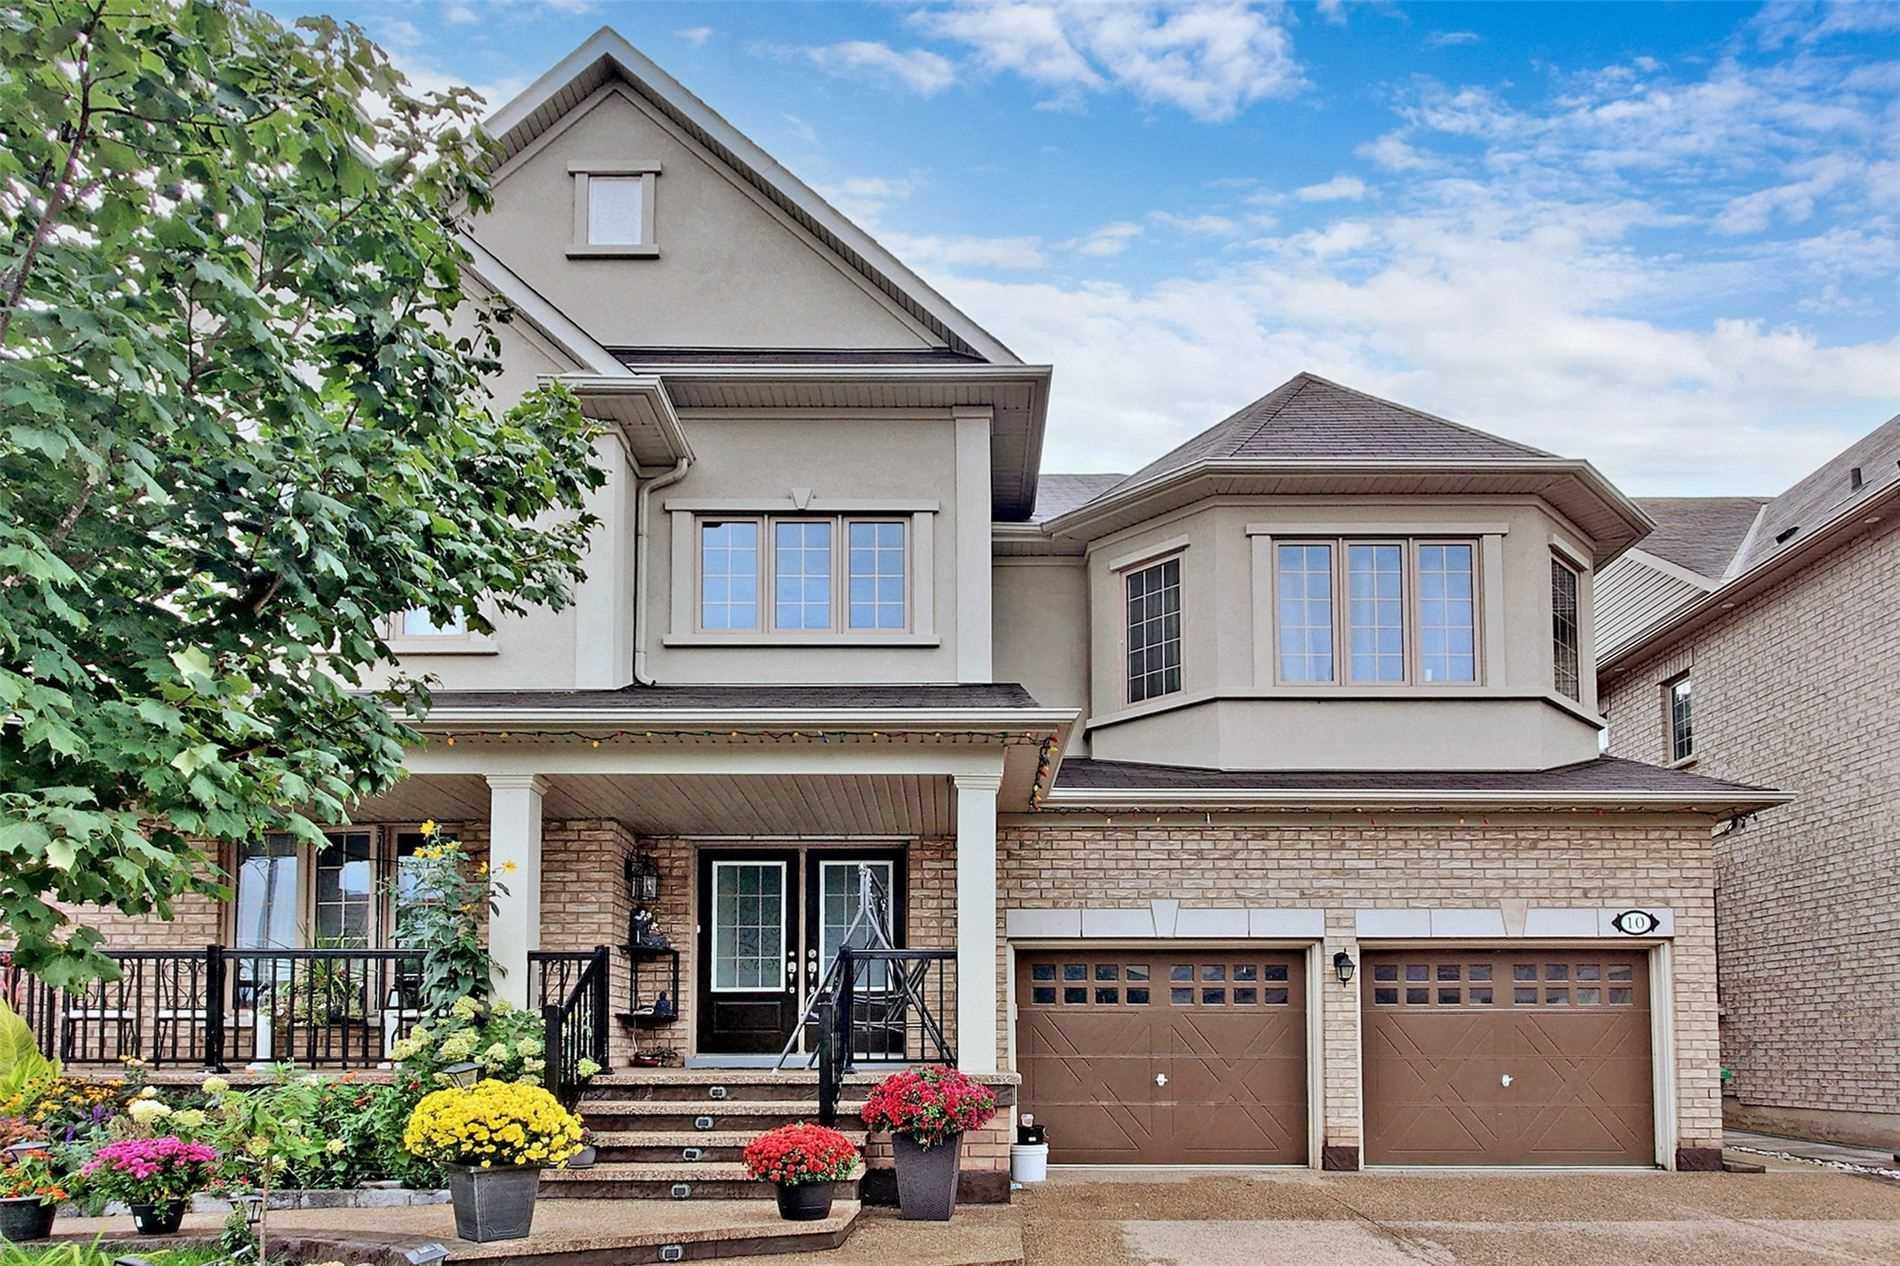 Detached house For Lease In Brampton - 10 Lloyd Sanderson Dr, Brampton, Ontario, Canada L6Y 0G8 , 2 Bedrooms Bedrooms, ,1 BathroomBathrooms,Detached,For Lease,Lloyd Sanderson